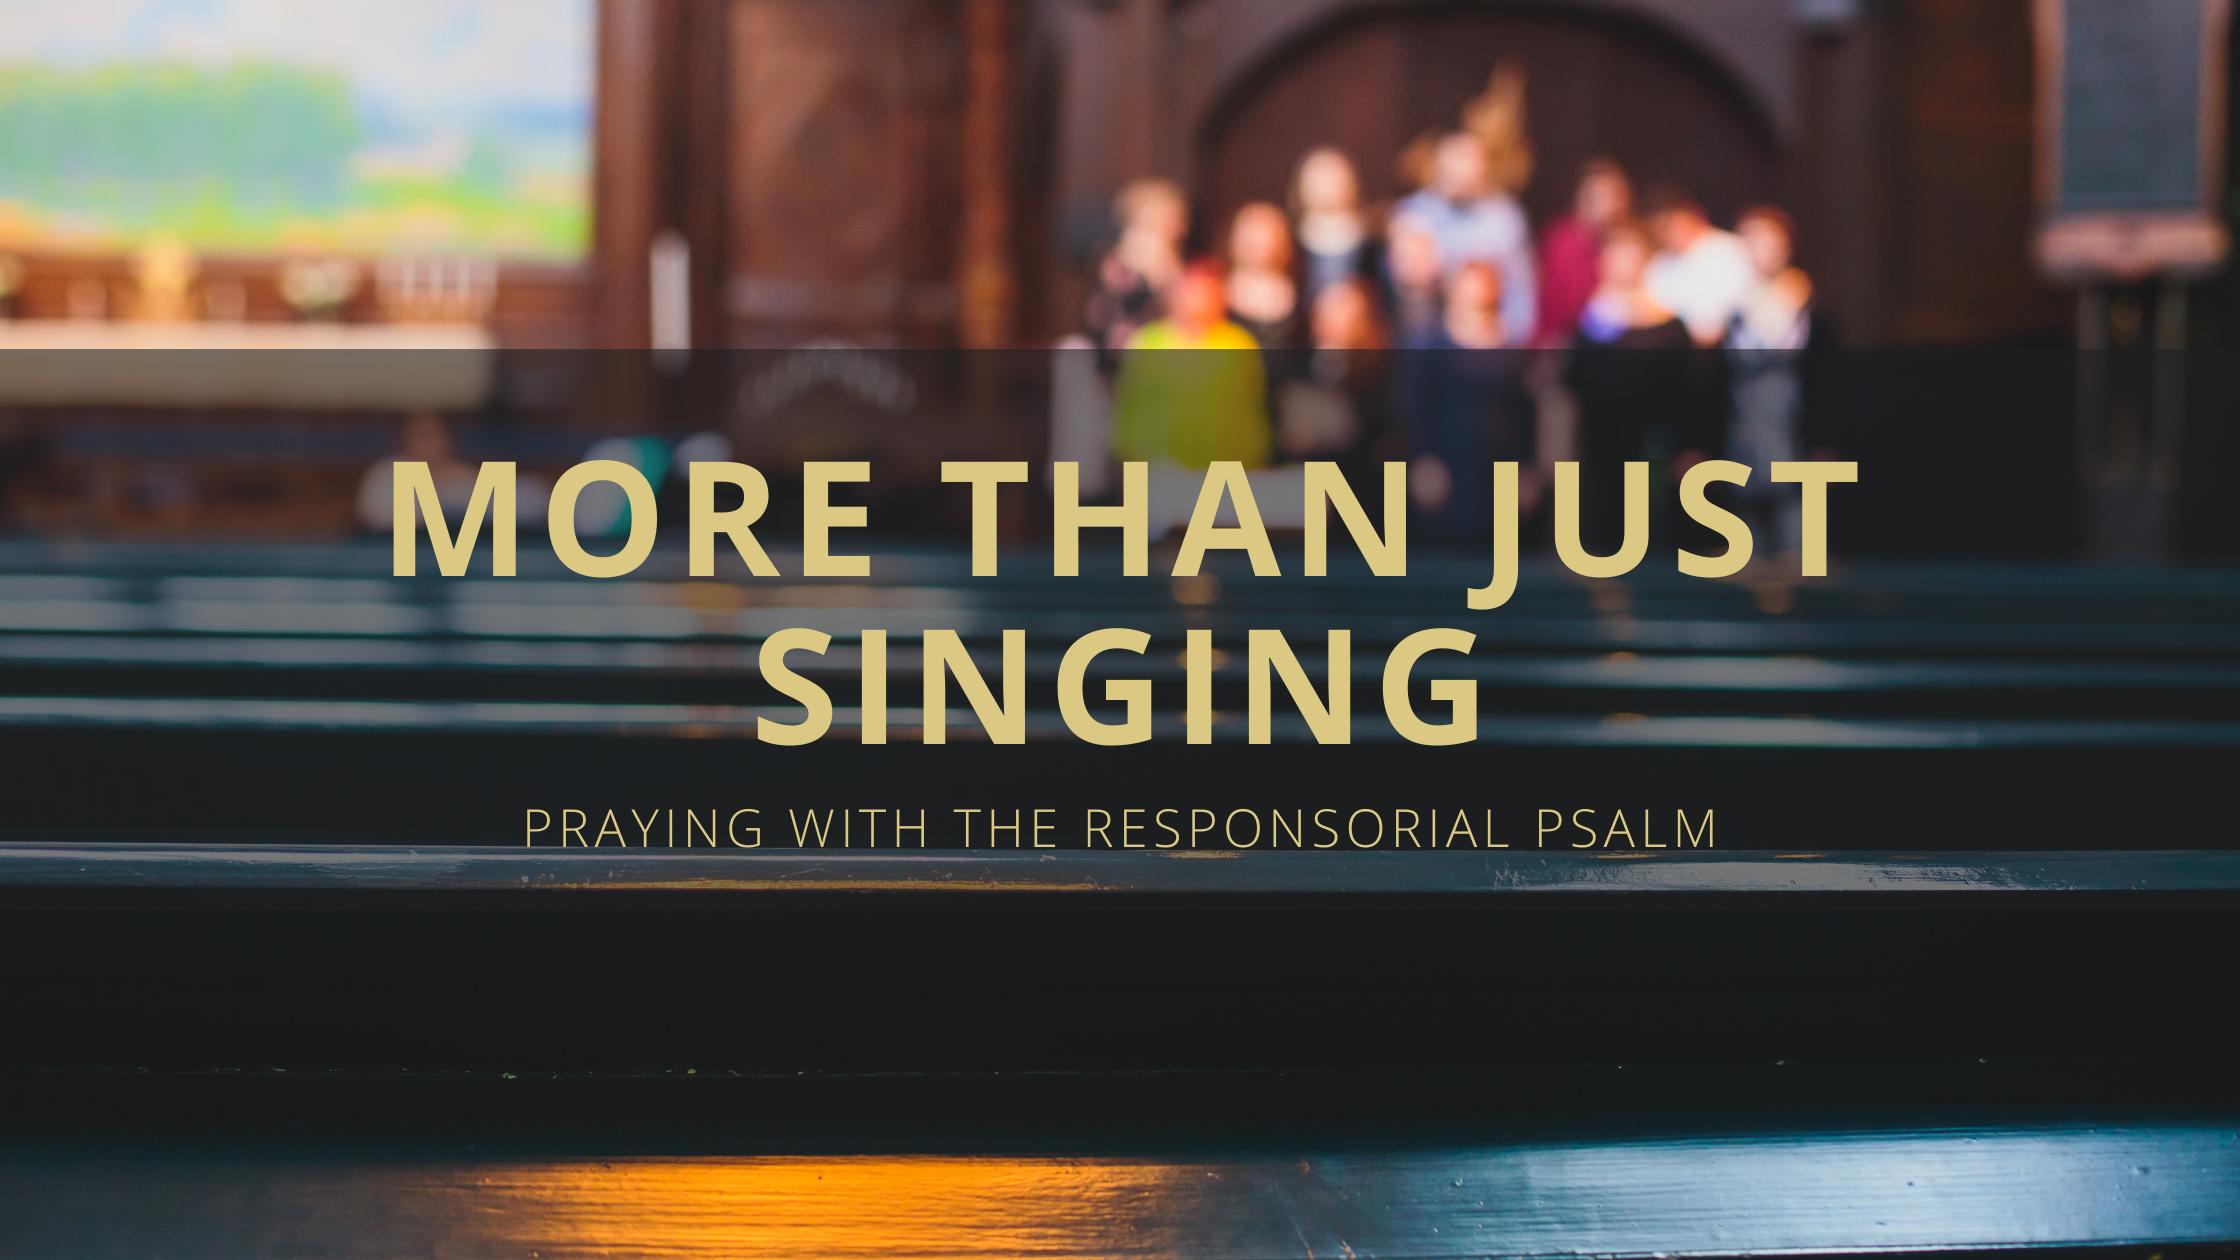 More Than Just Singing